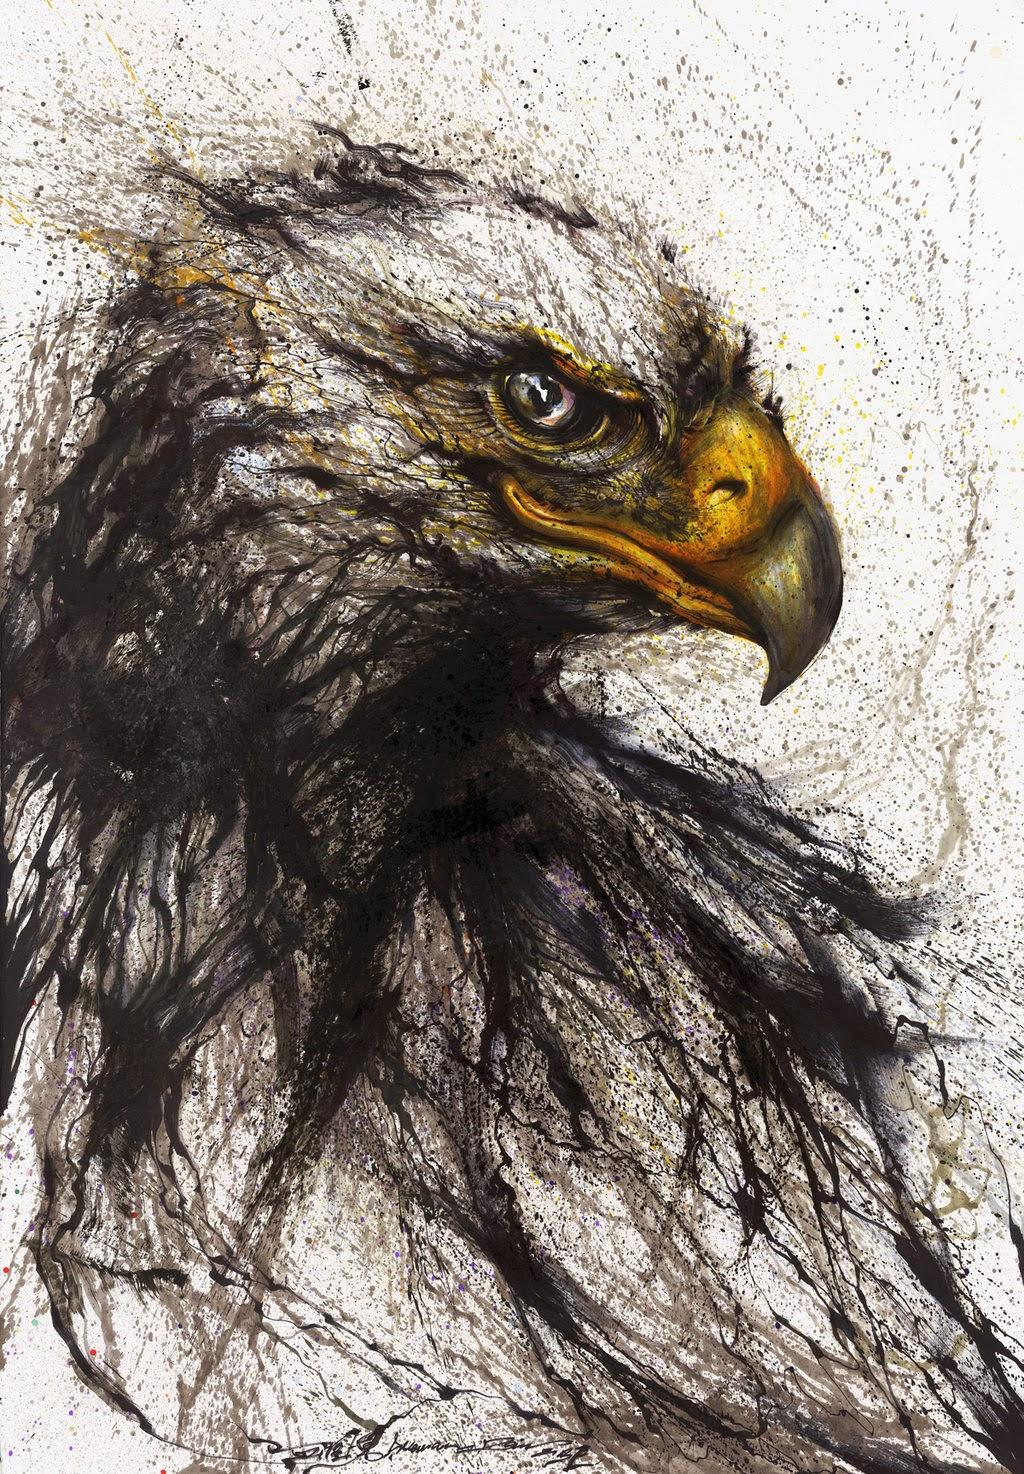 05-Eagle-1-Hua-Tunan-huatunan-Melting-&-Running-Ink-Drawings-www-designstack-co